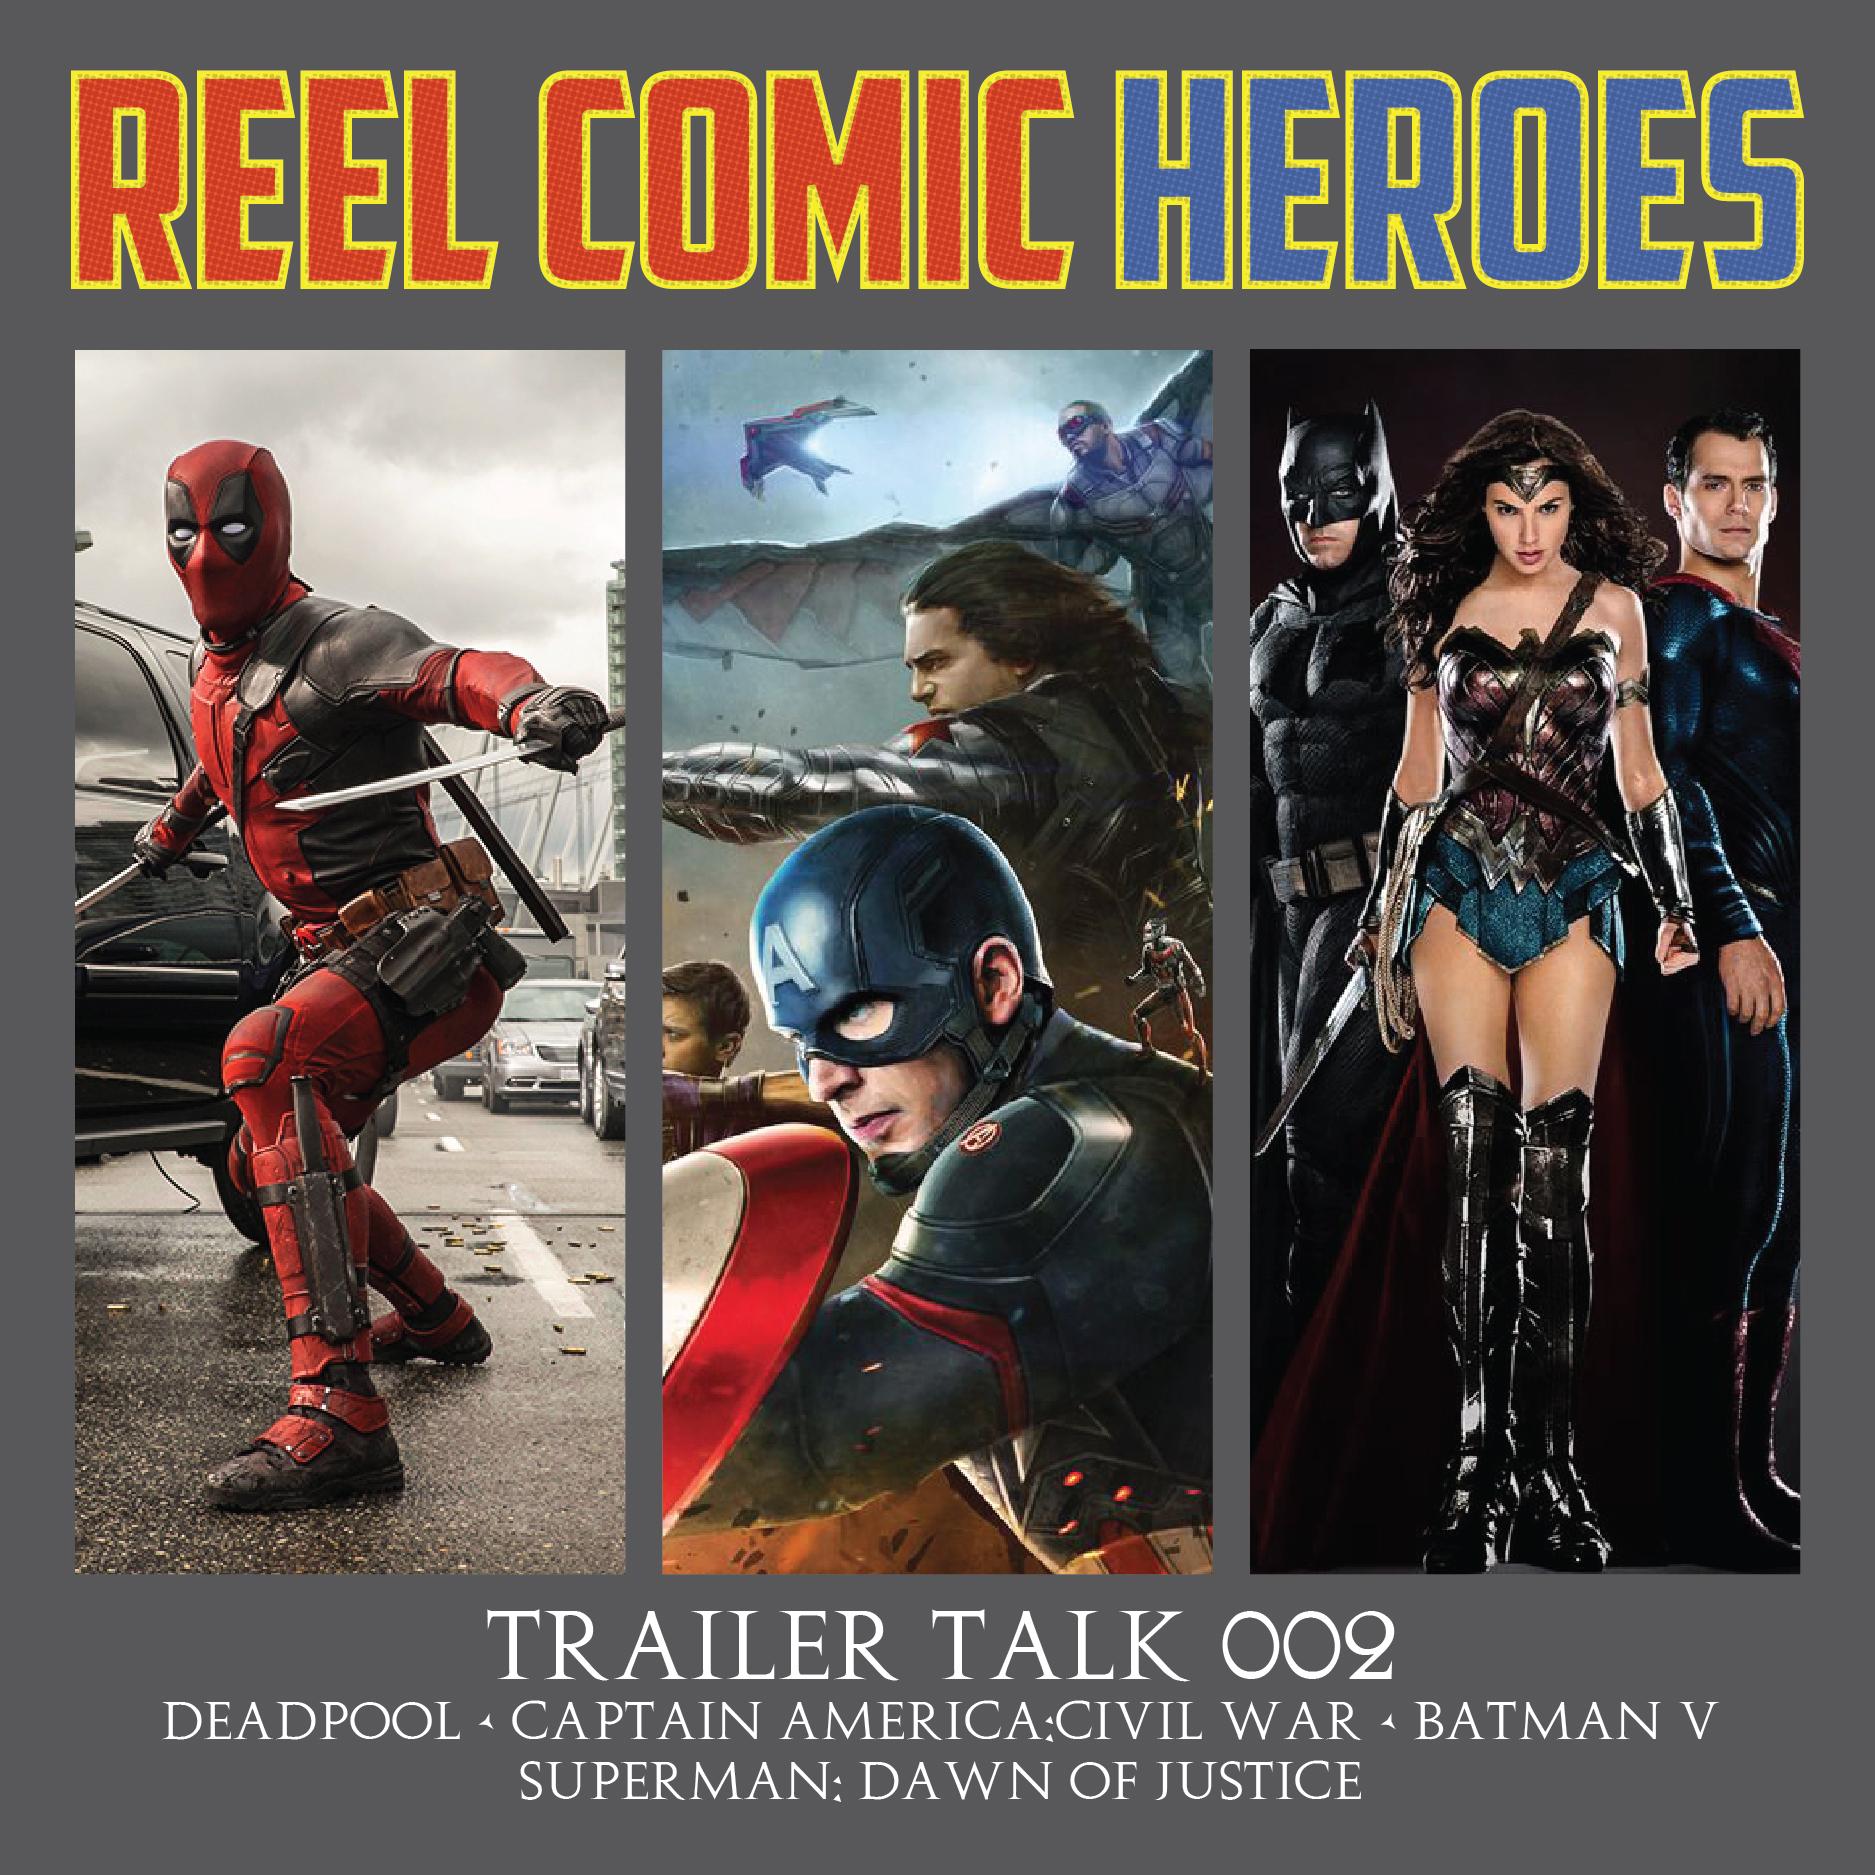 Artwork for Reel Comic Heroes - Trailer Talk 002